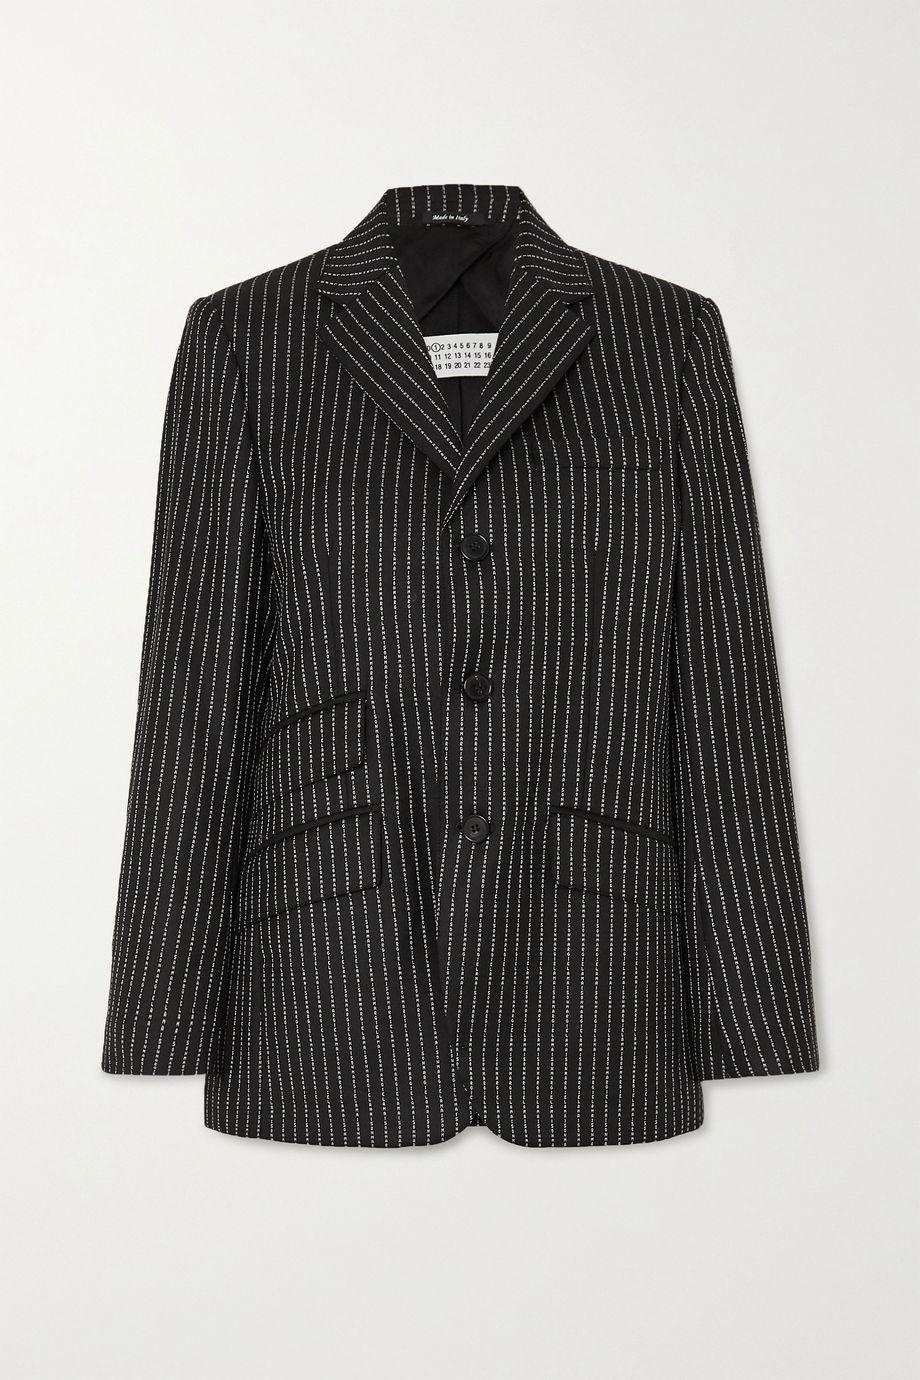 Maison Margiela 羊毛混纺提花西装外套